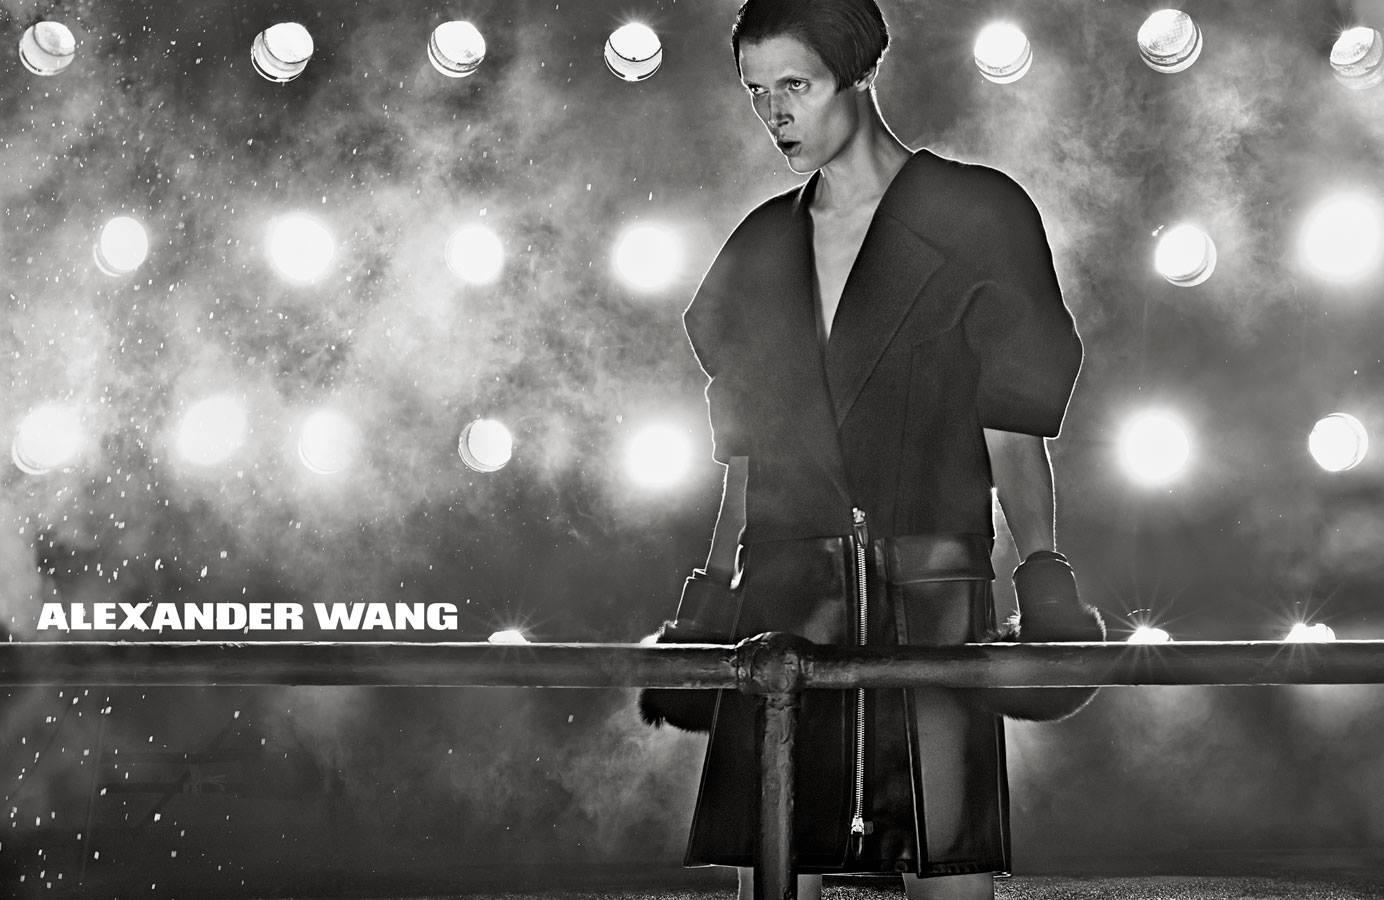 malgosia-bela-by-steven-klein-for-alexander-wang-campaign-fw-2013-2014-3